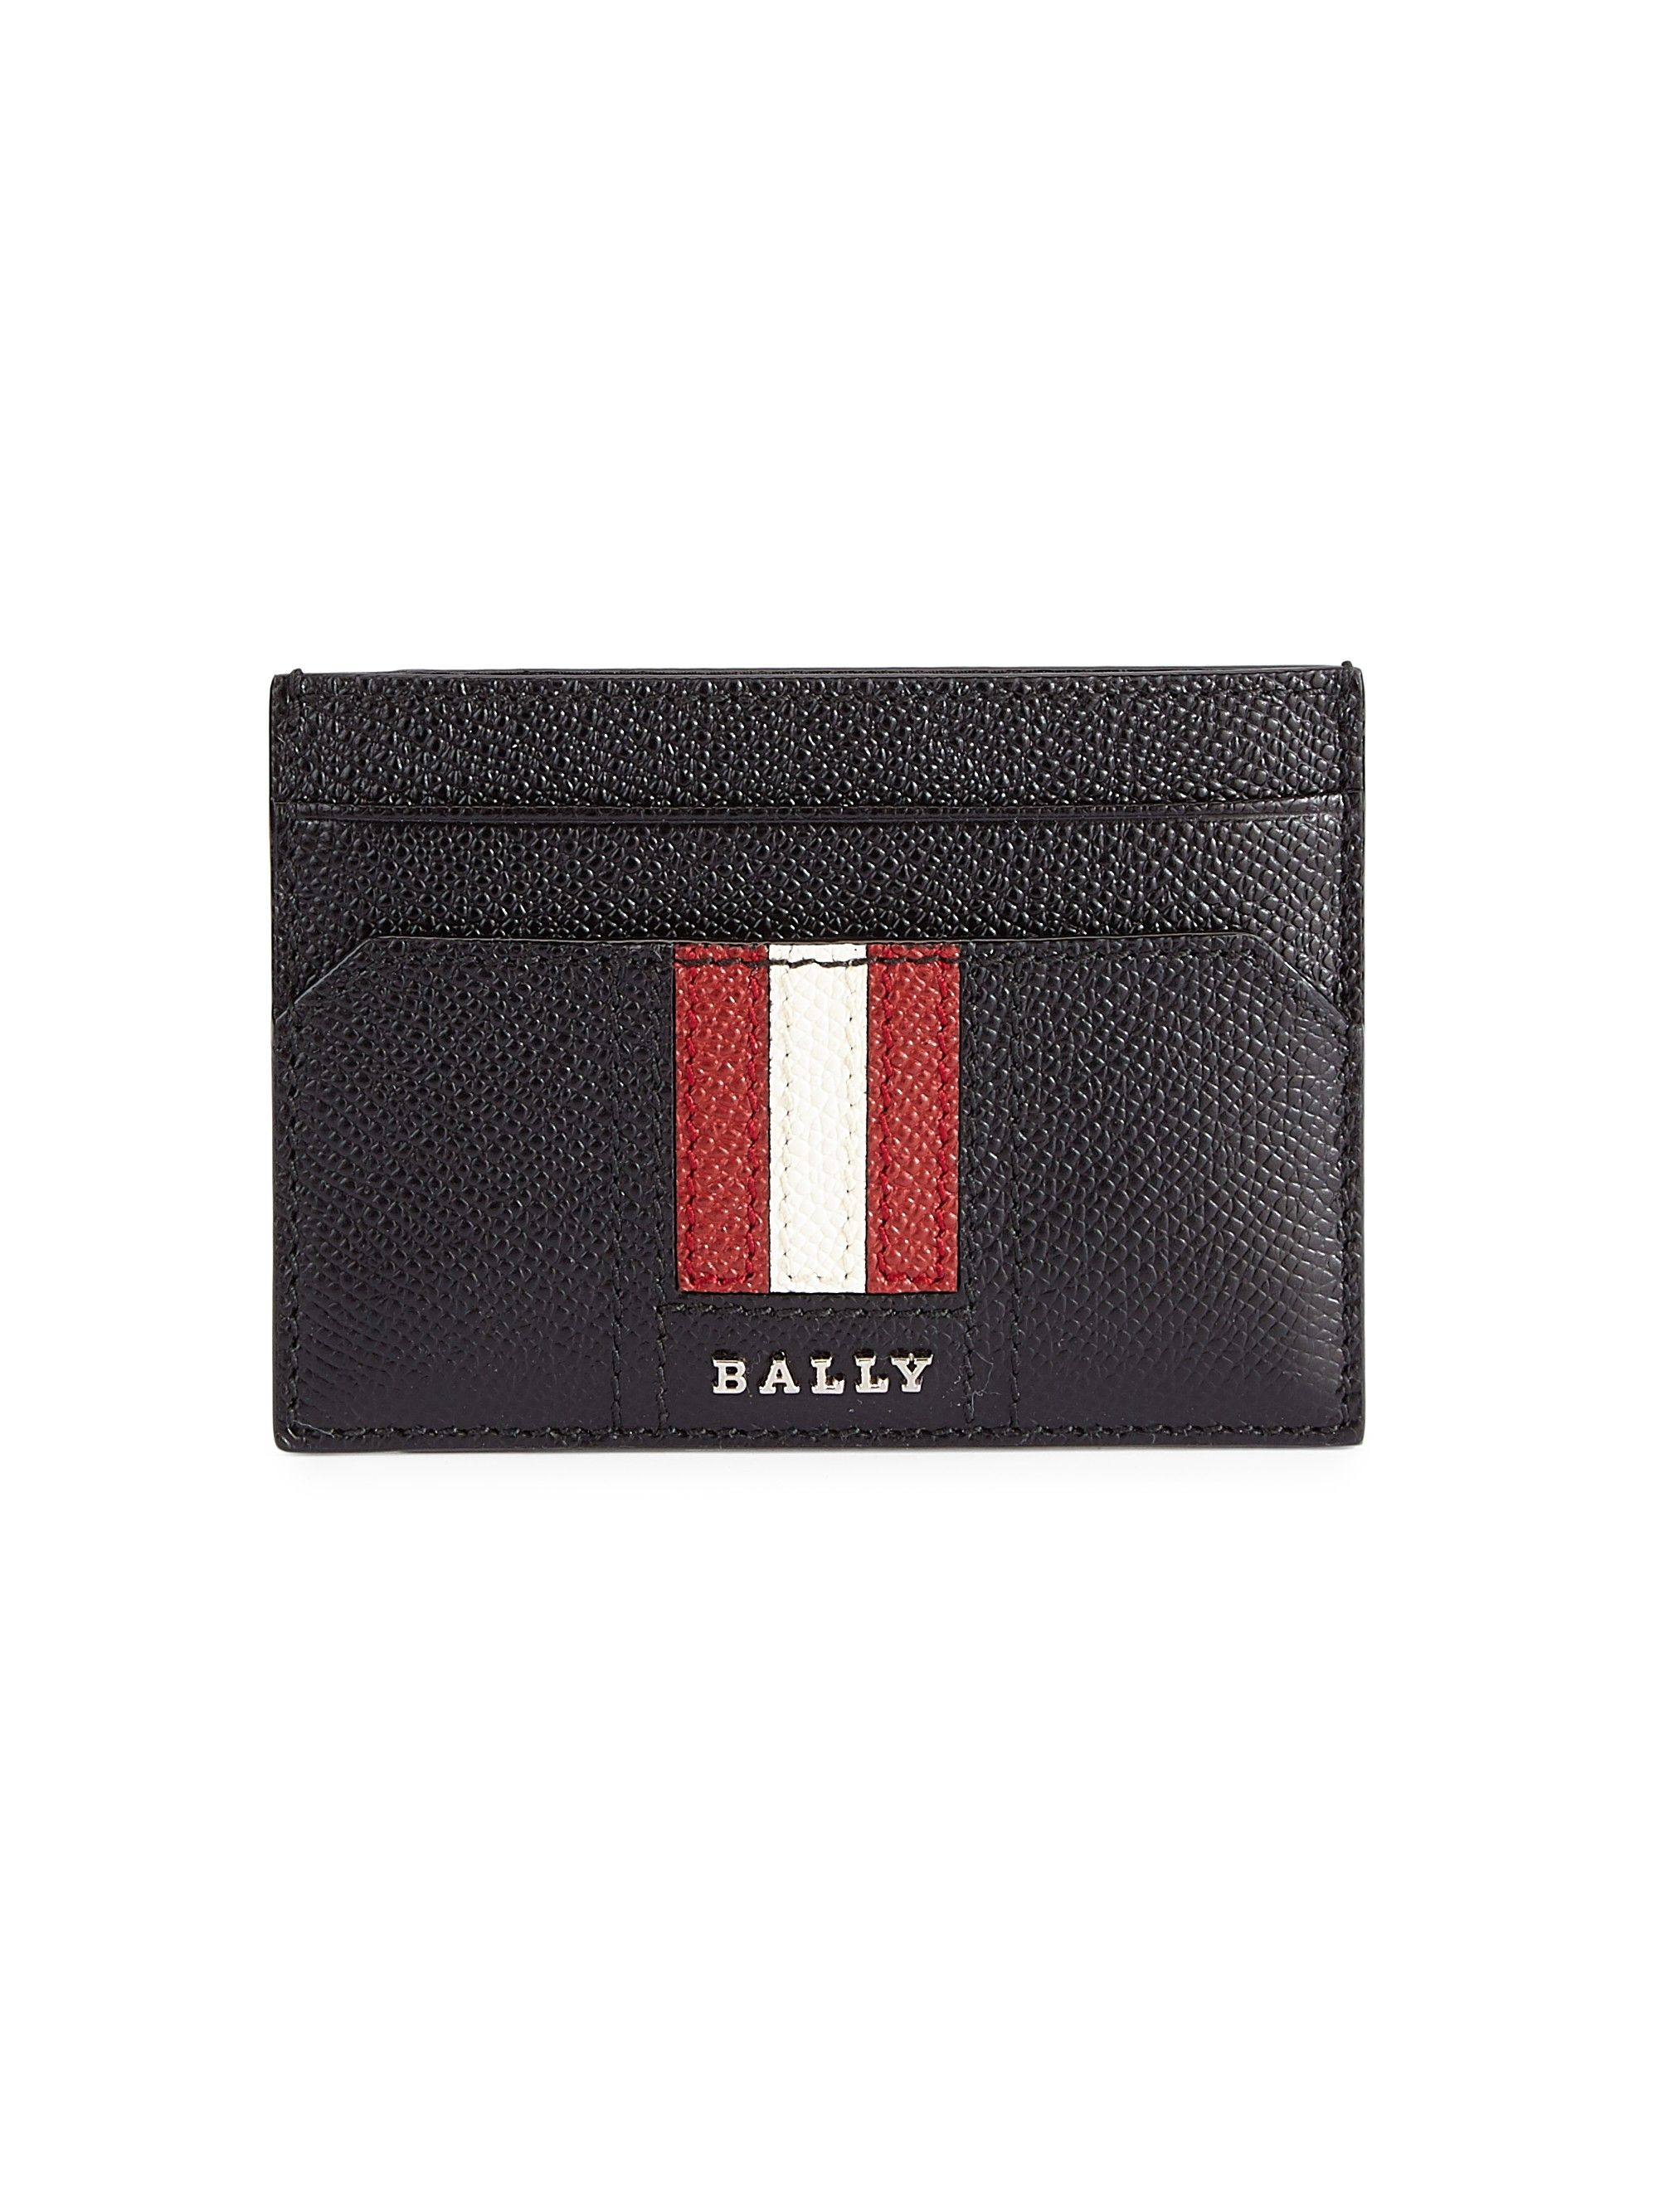 Taclipo Leather Business Card Holder, Black | Pinterest